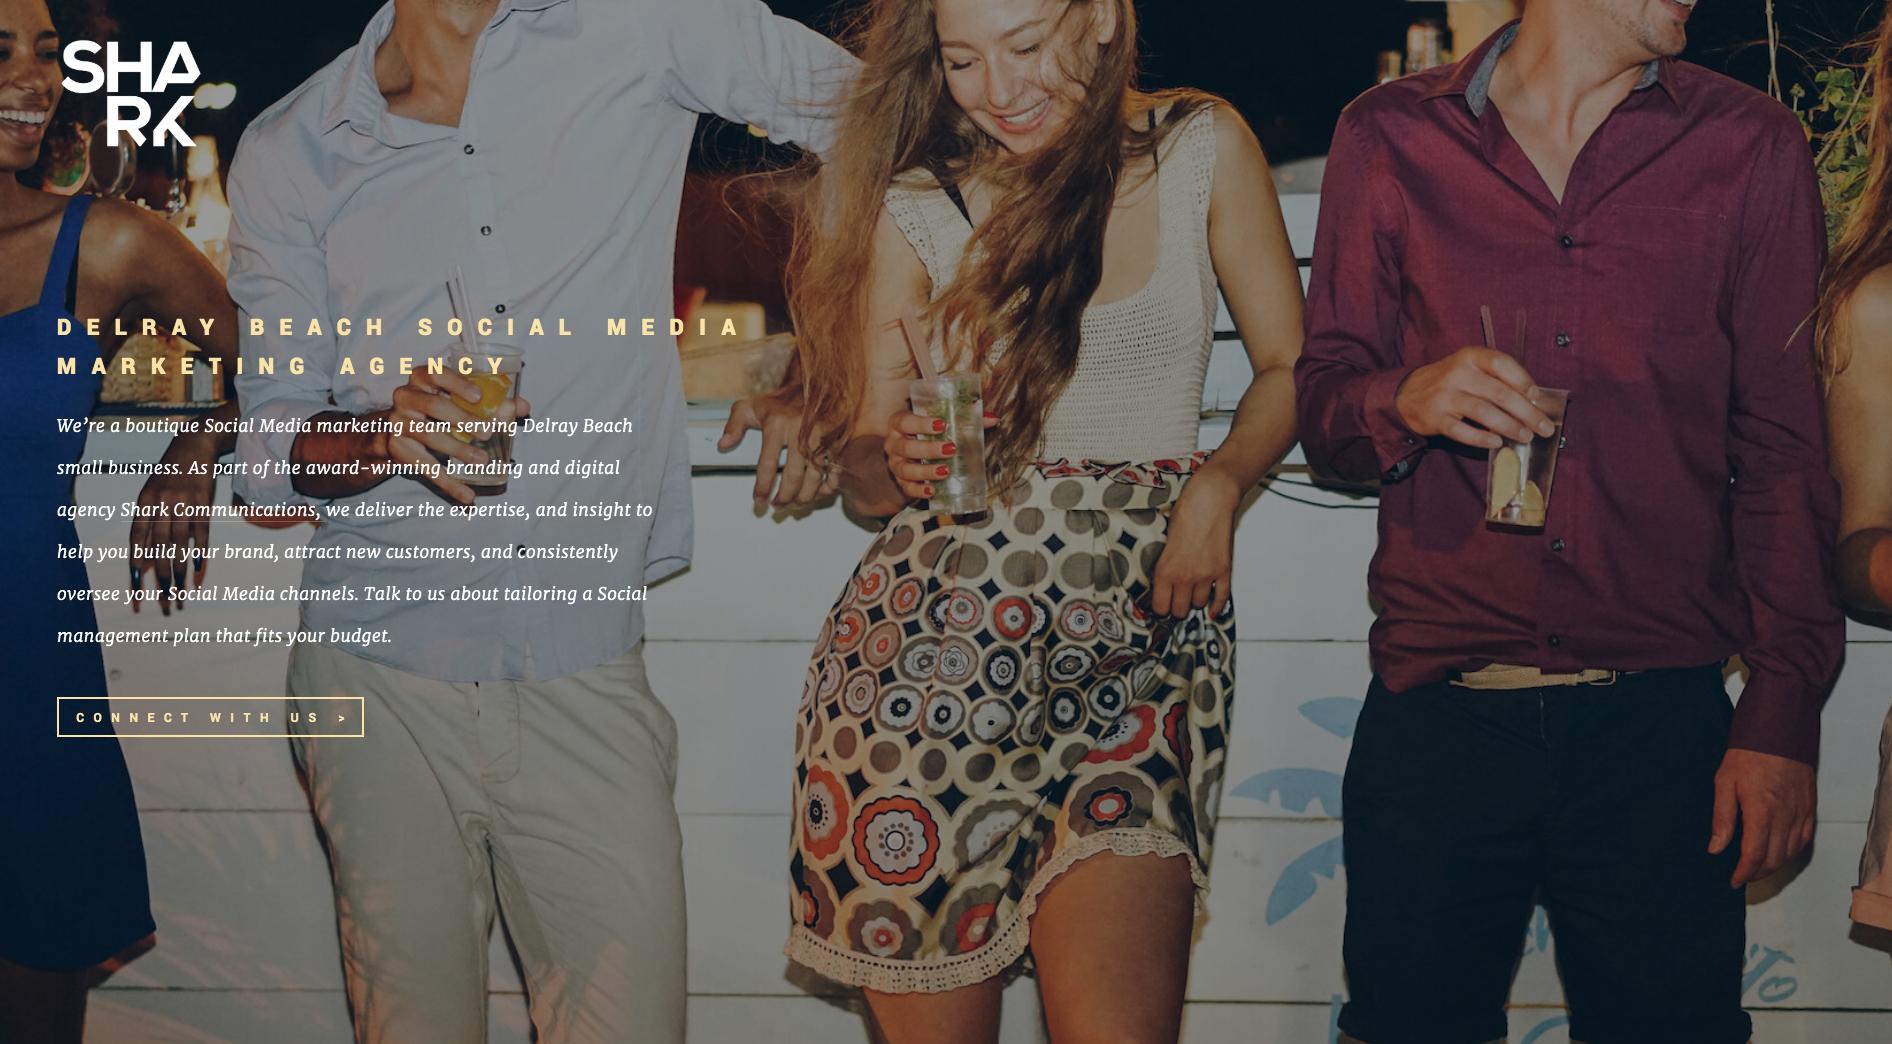 Delray_Beach_Social_Marketing_Agency.png